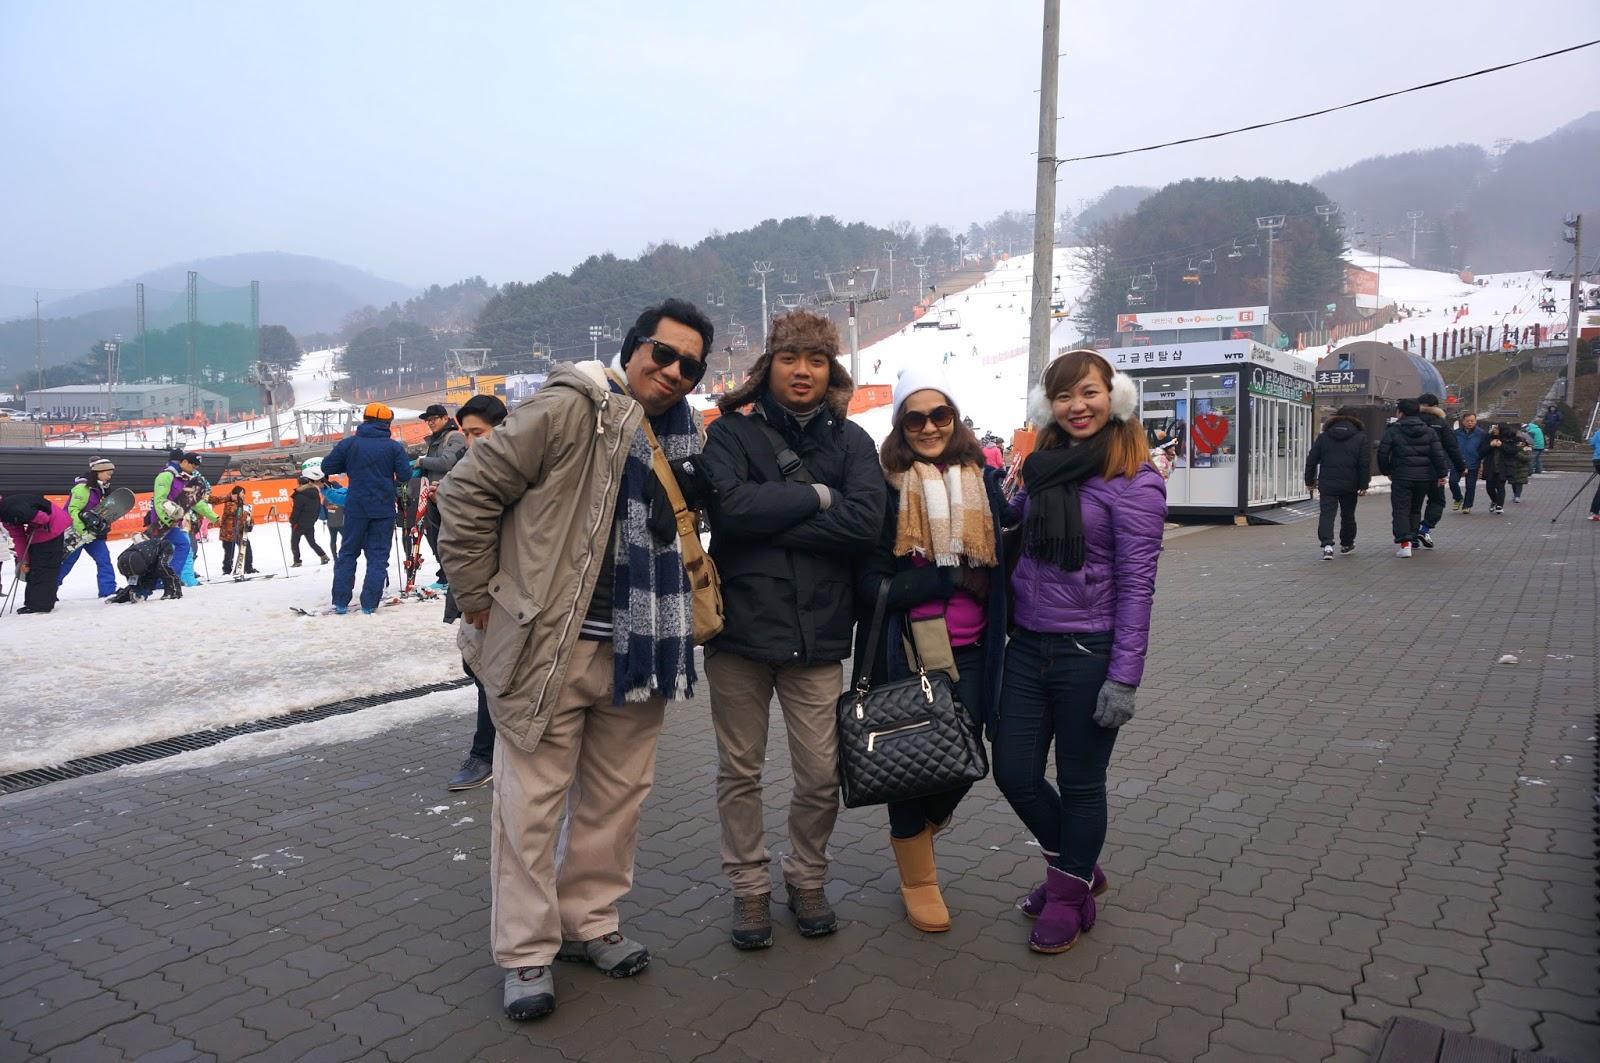 walk with cham: bearstown ski resort south korea